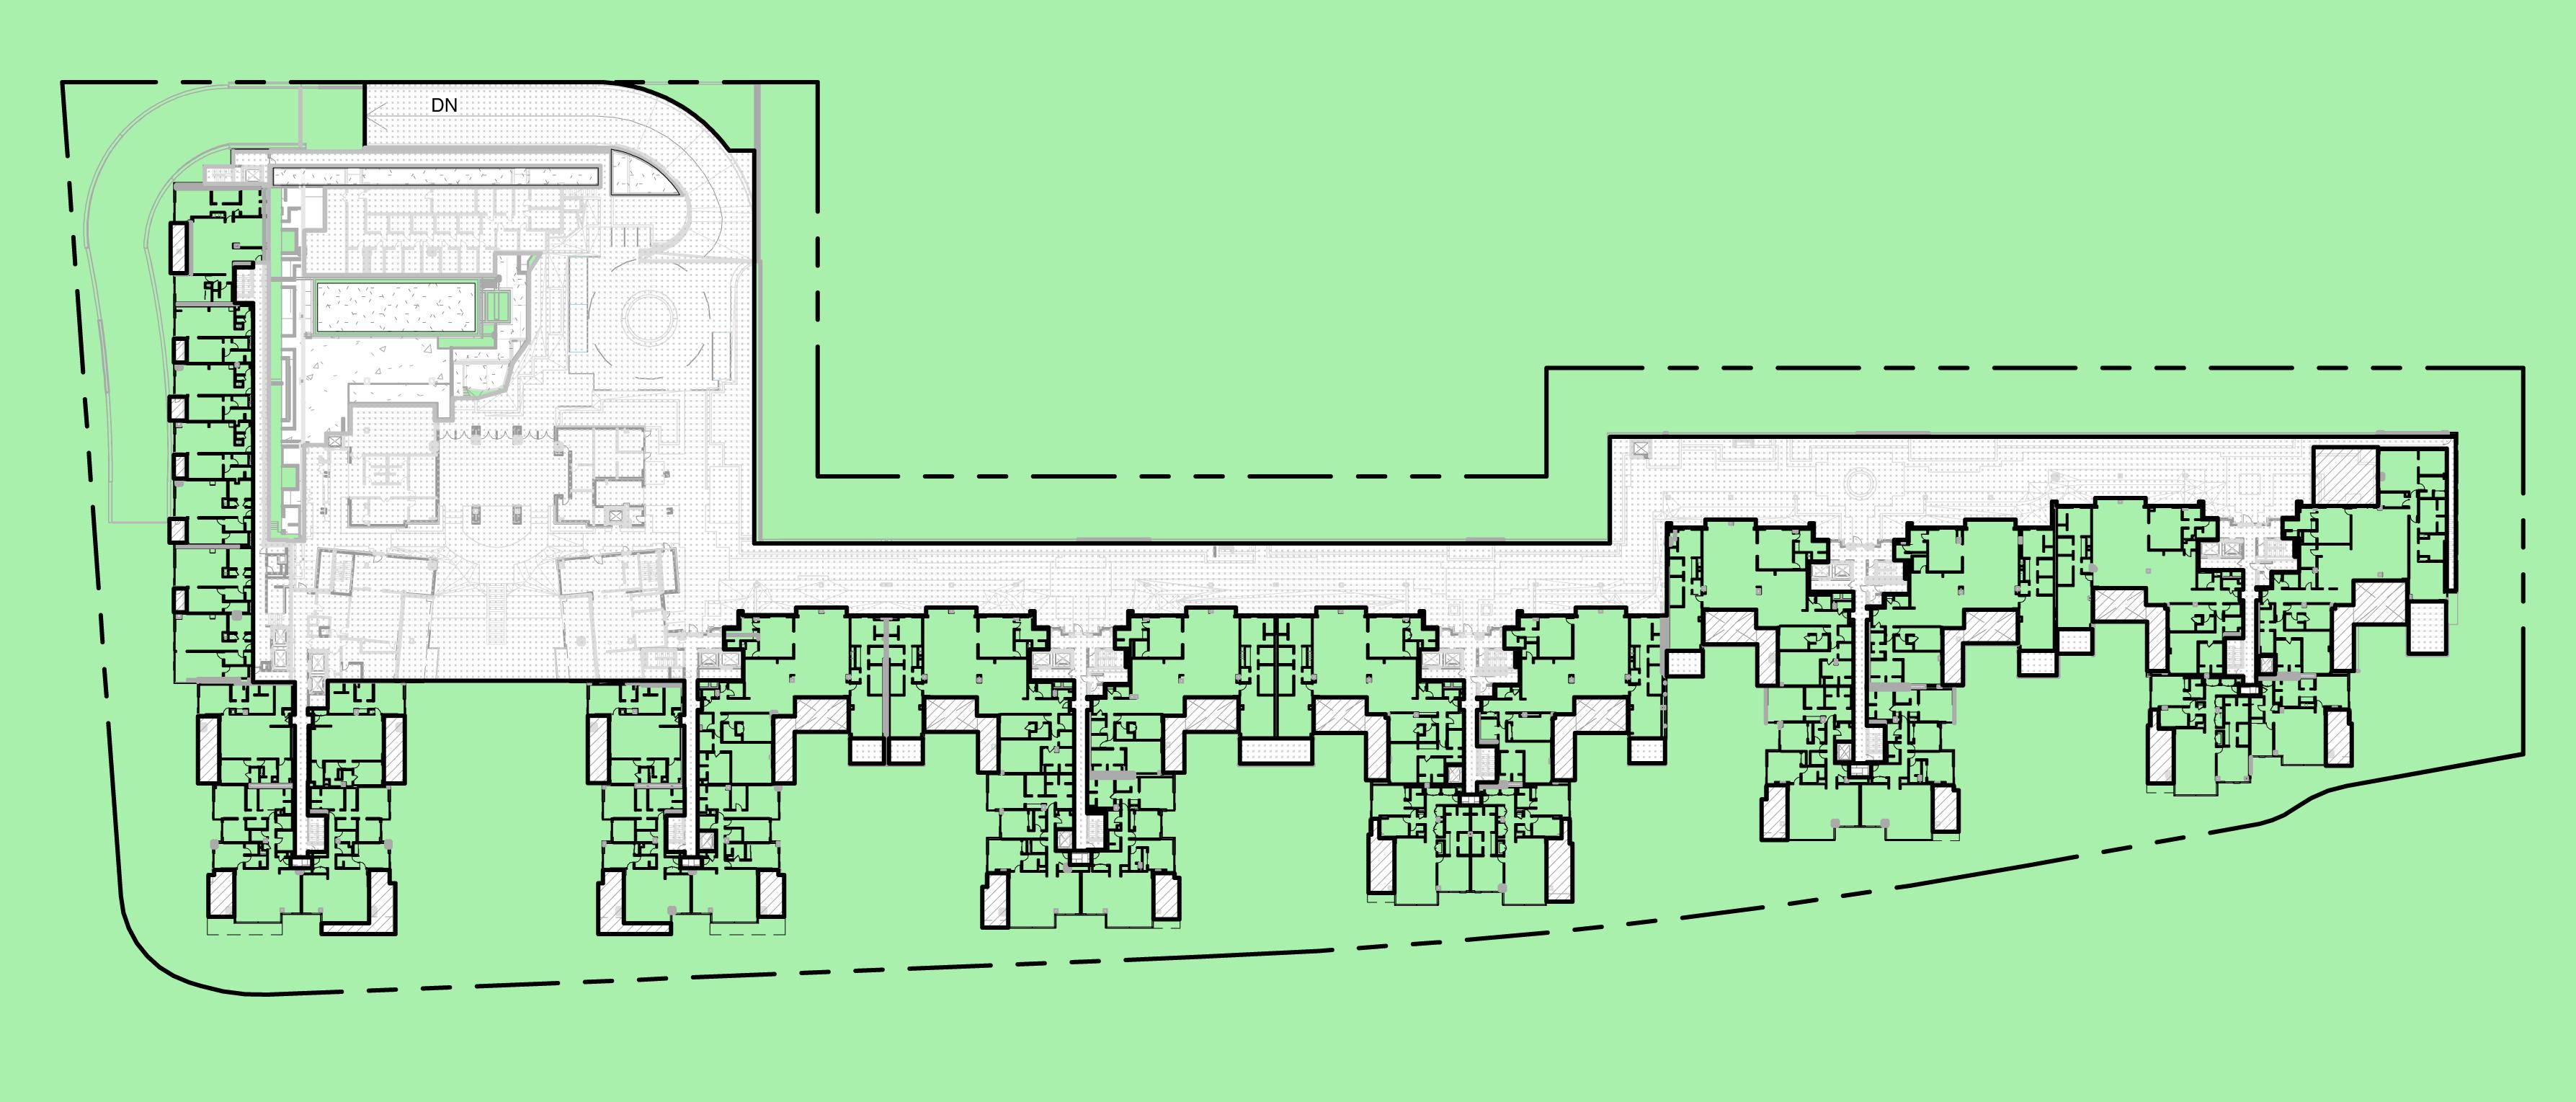 Park Lane Level 5